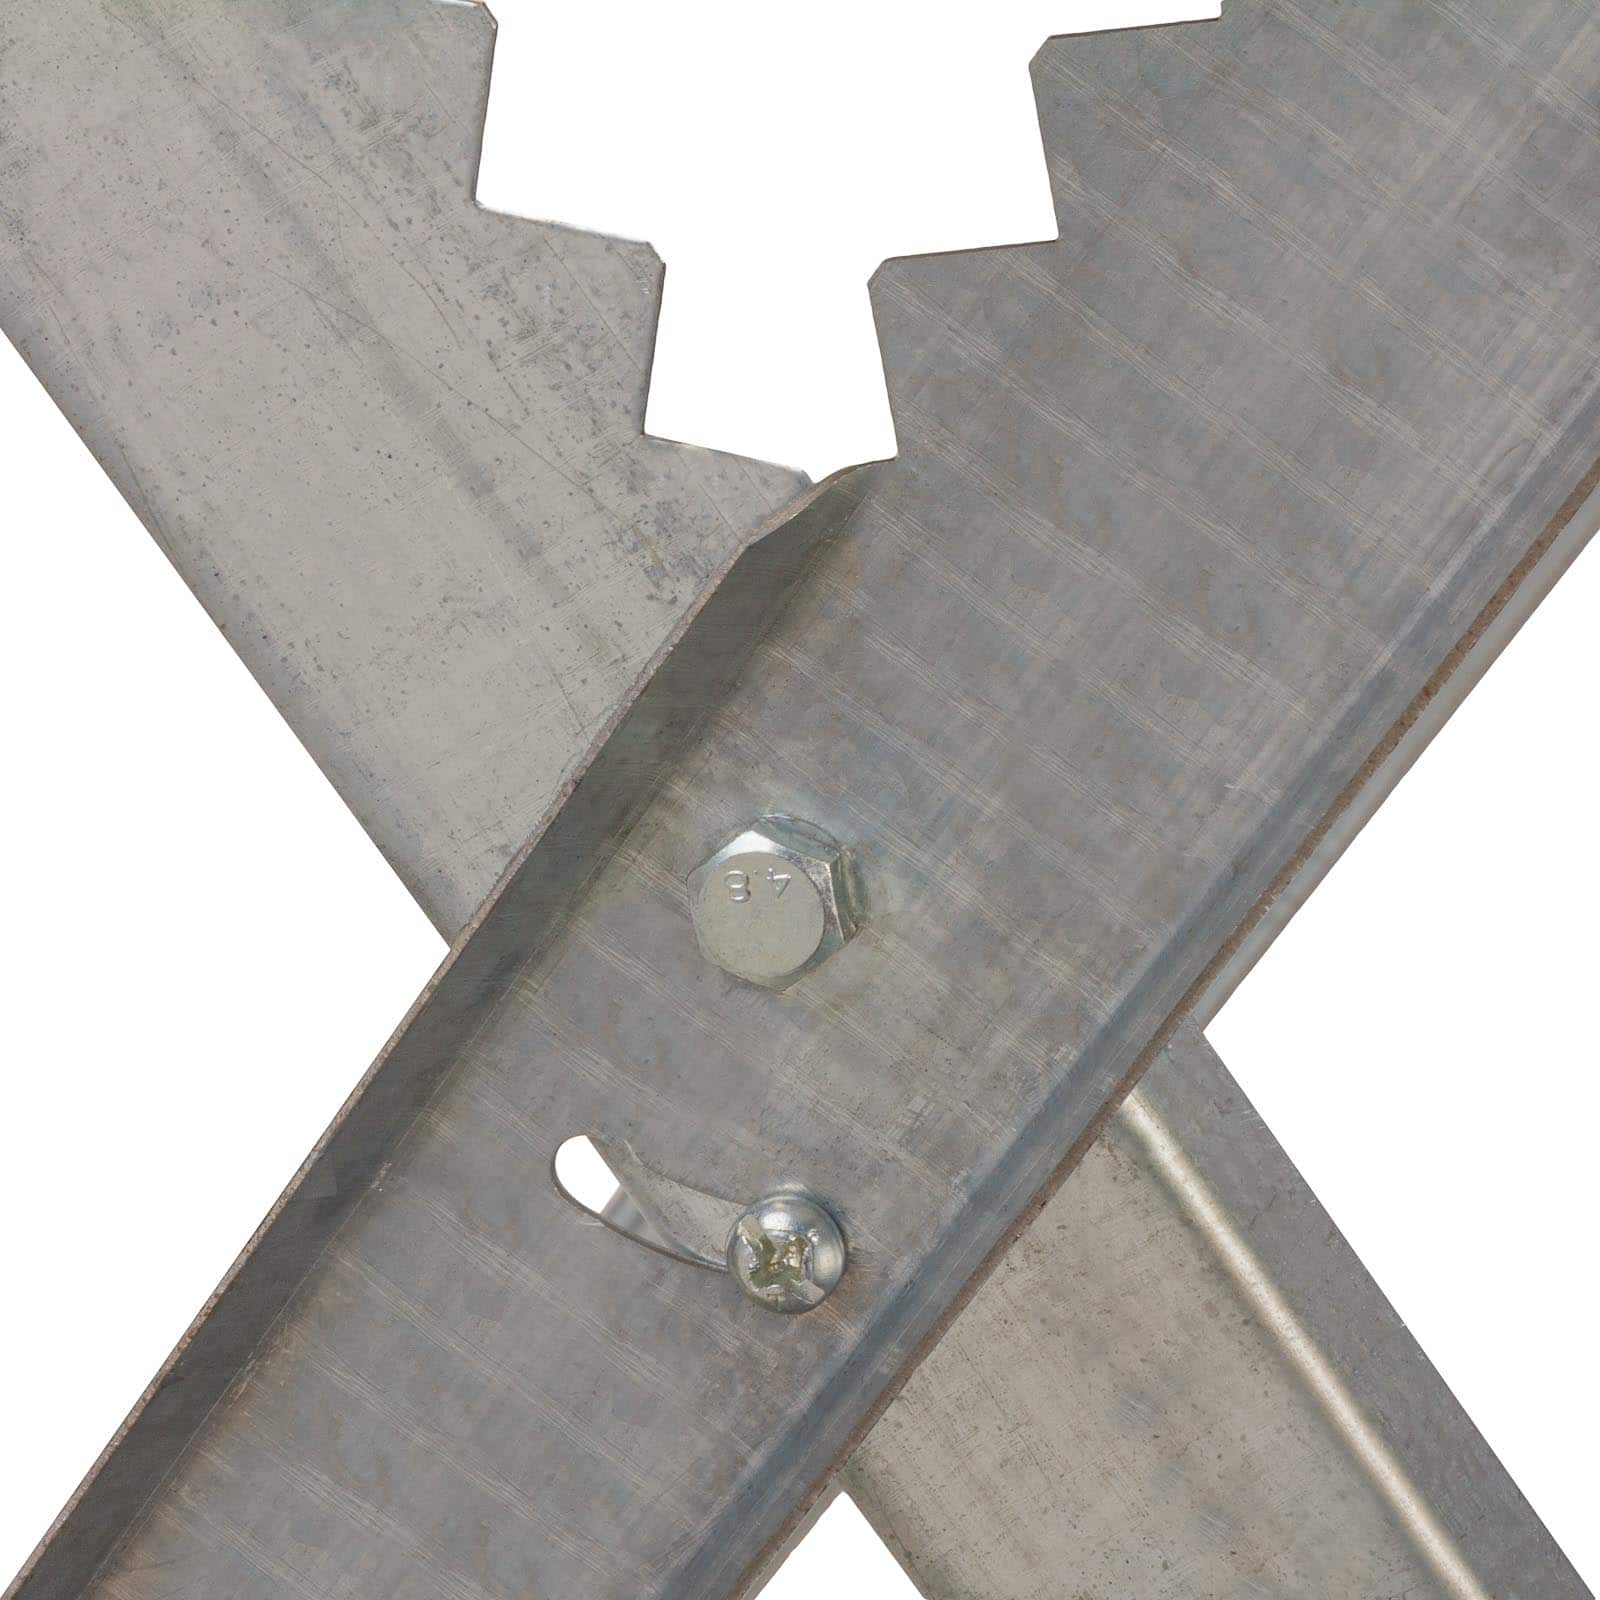 Hanse Werkzeuge® Stevige Opvouwbare Zaagbok 81x80,5x79cm - 150 kg